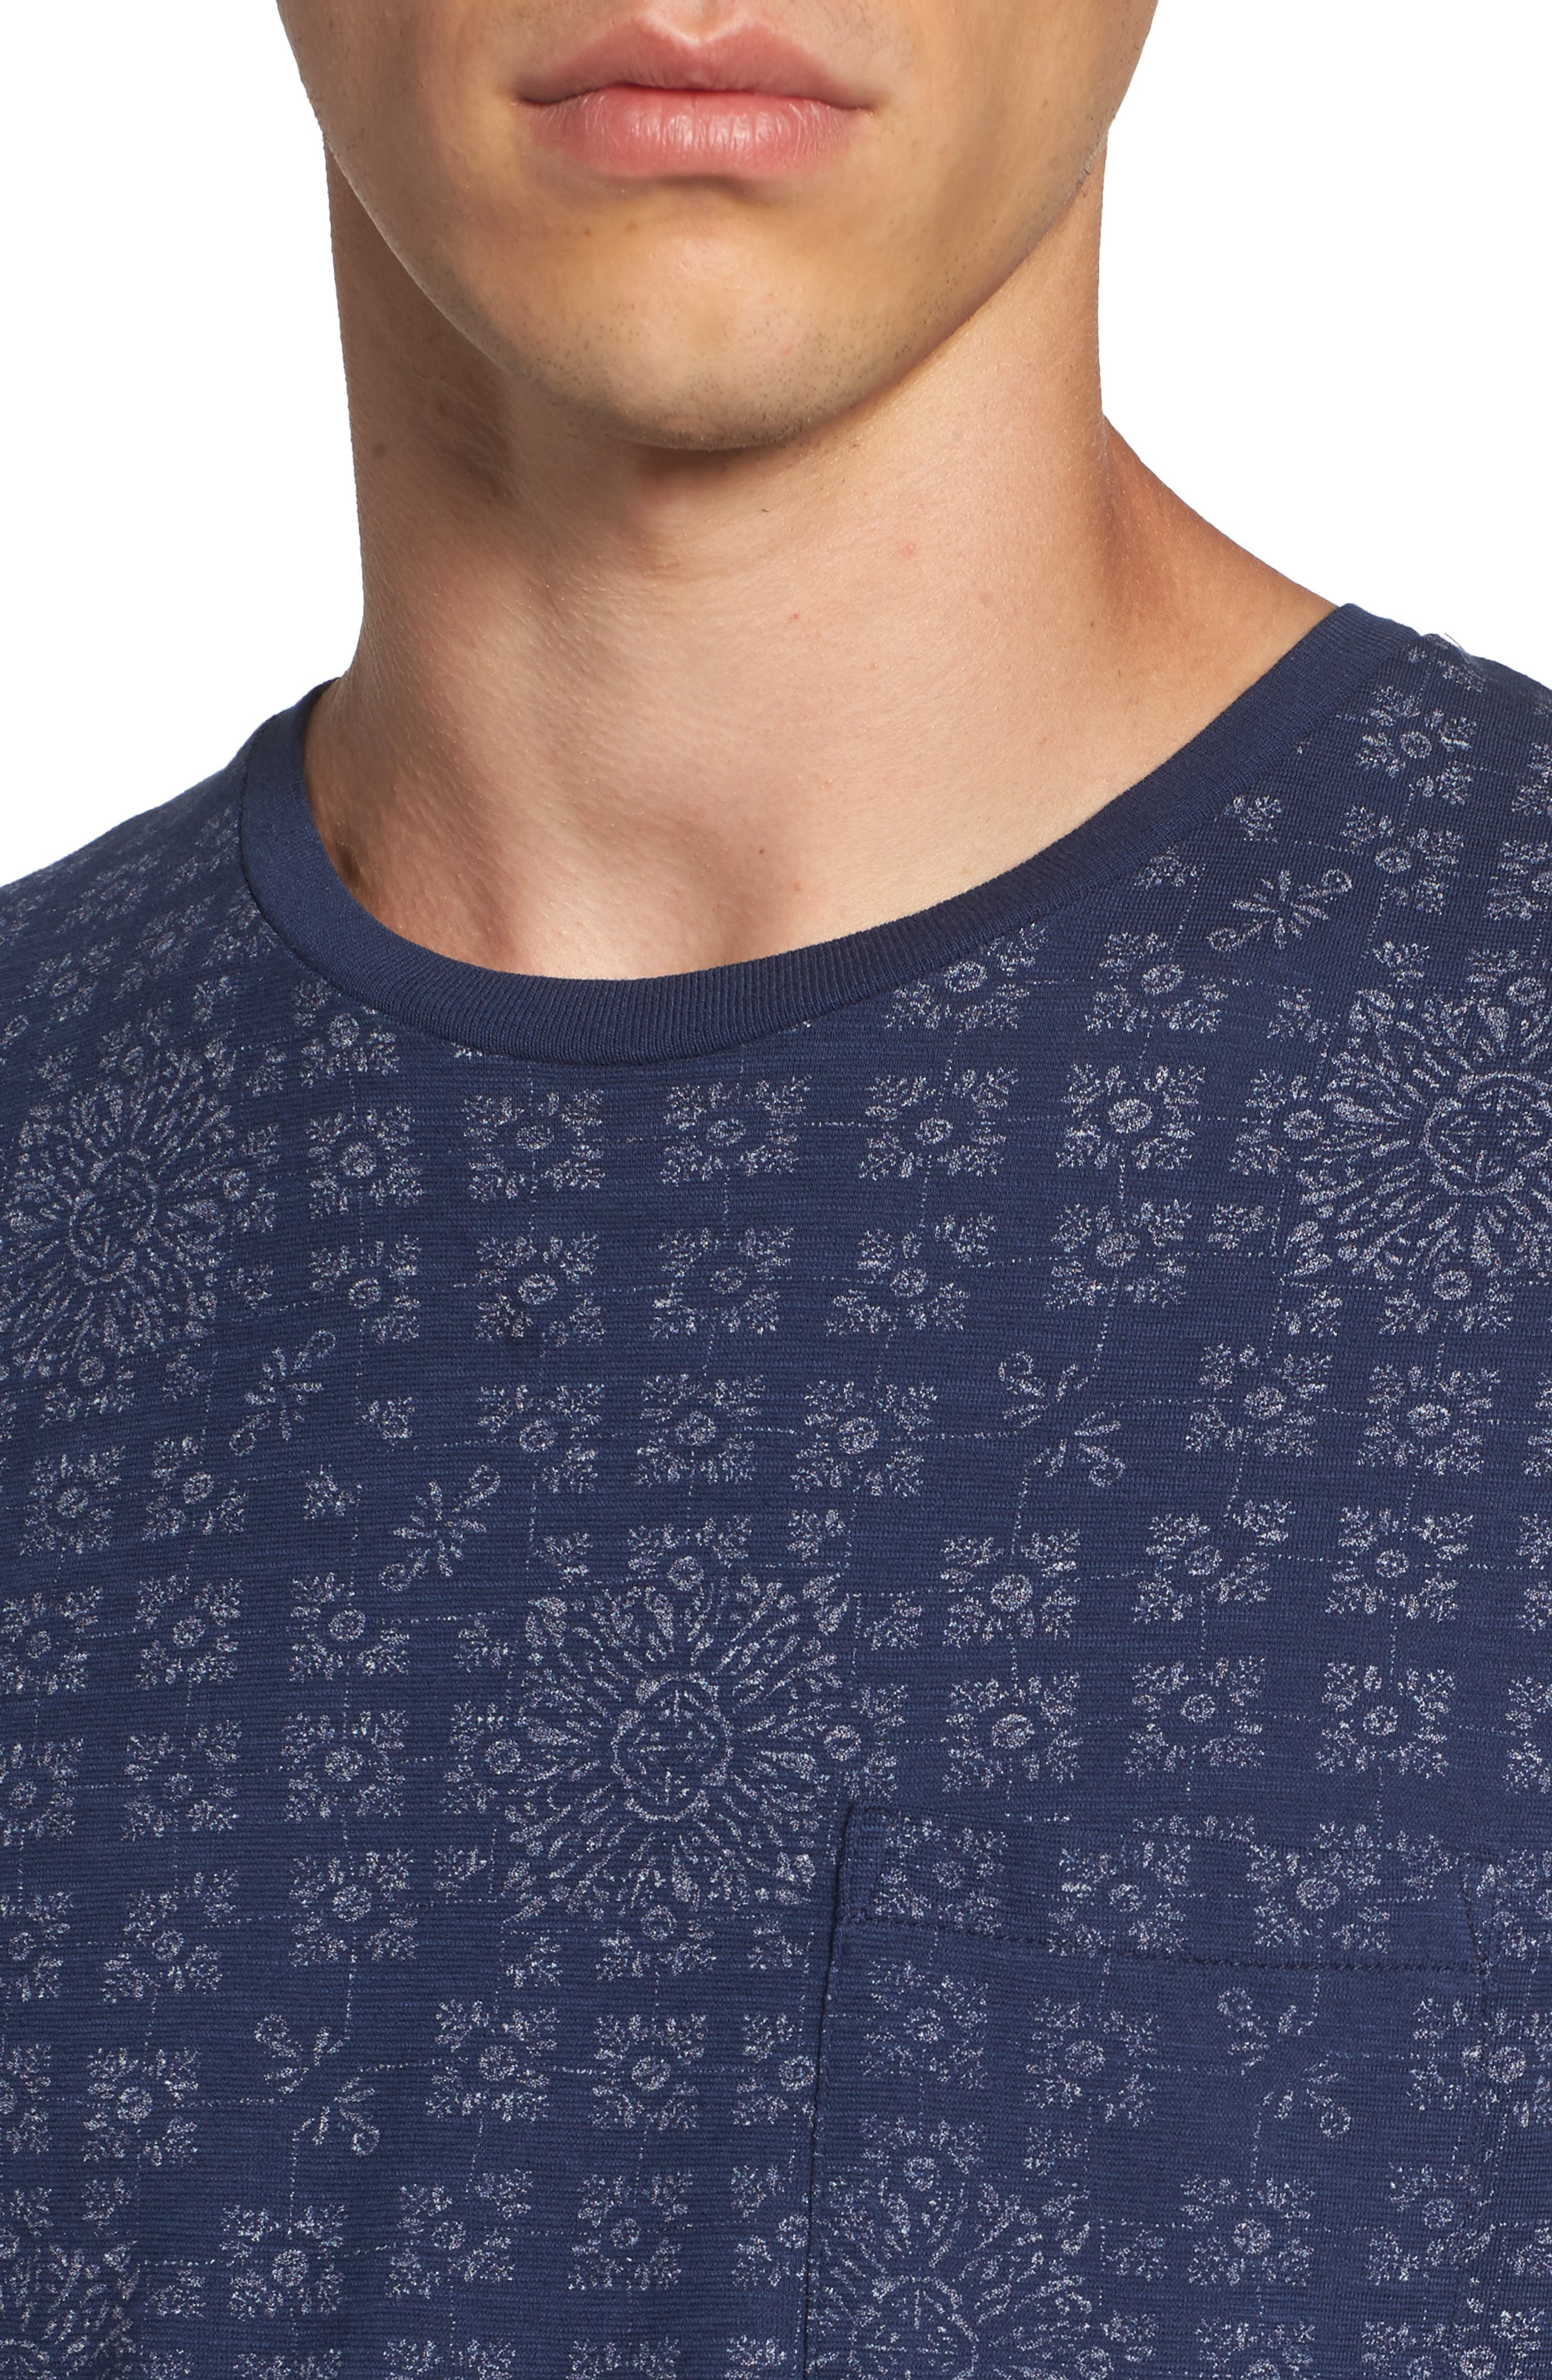 AMS Graphic T-Shirt,                             Alternate thumbnail 4, color,                             410